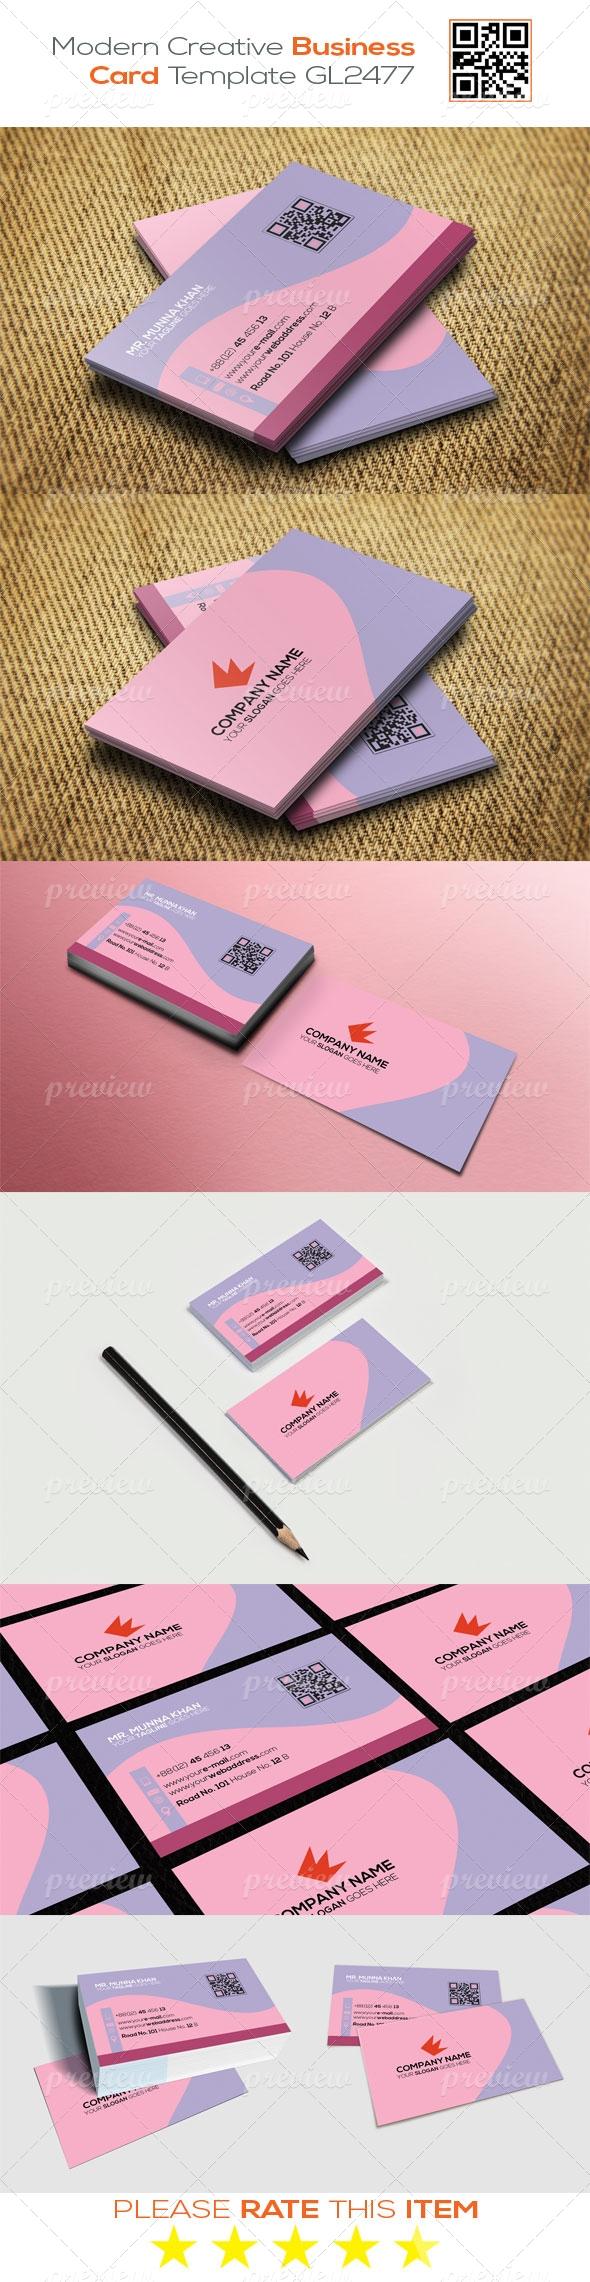 Modern Creative Business Card Template GL2477